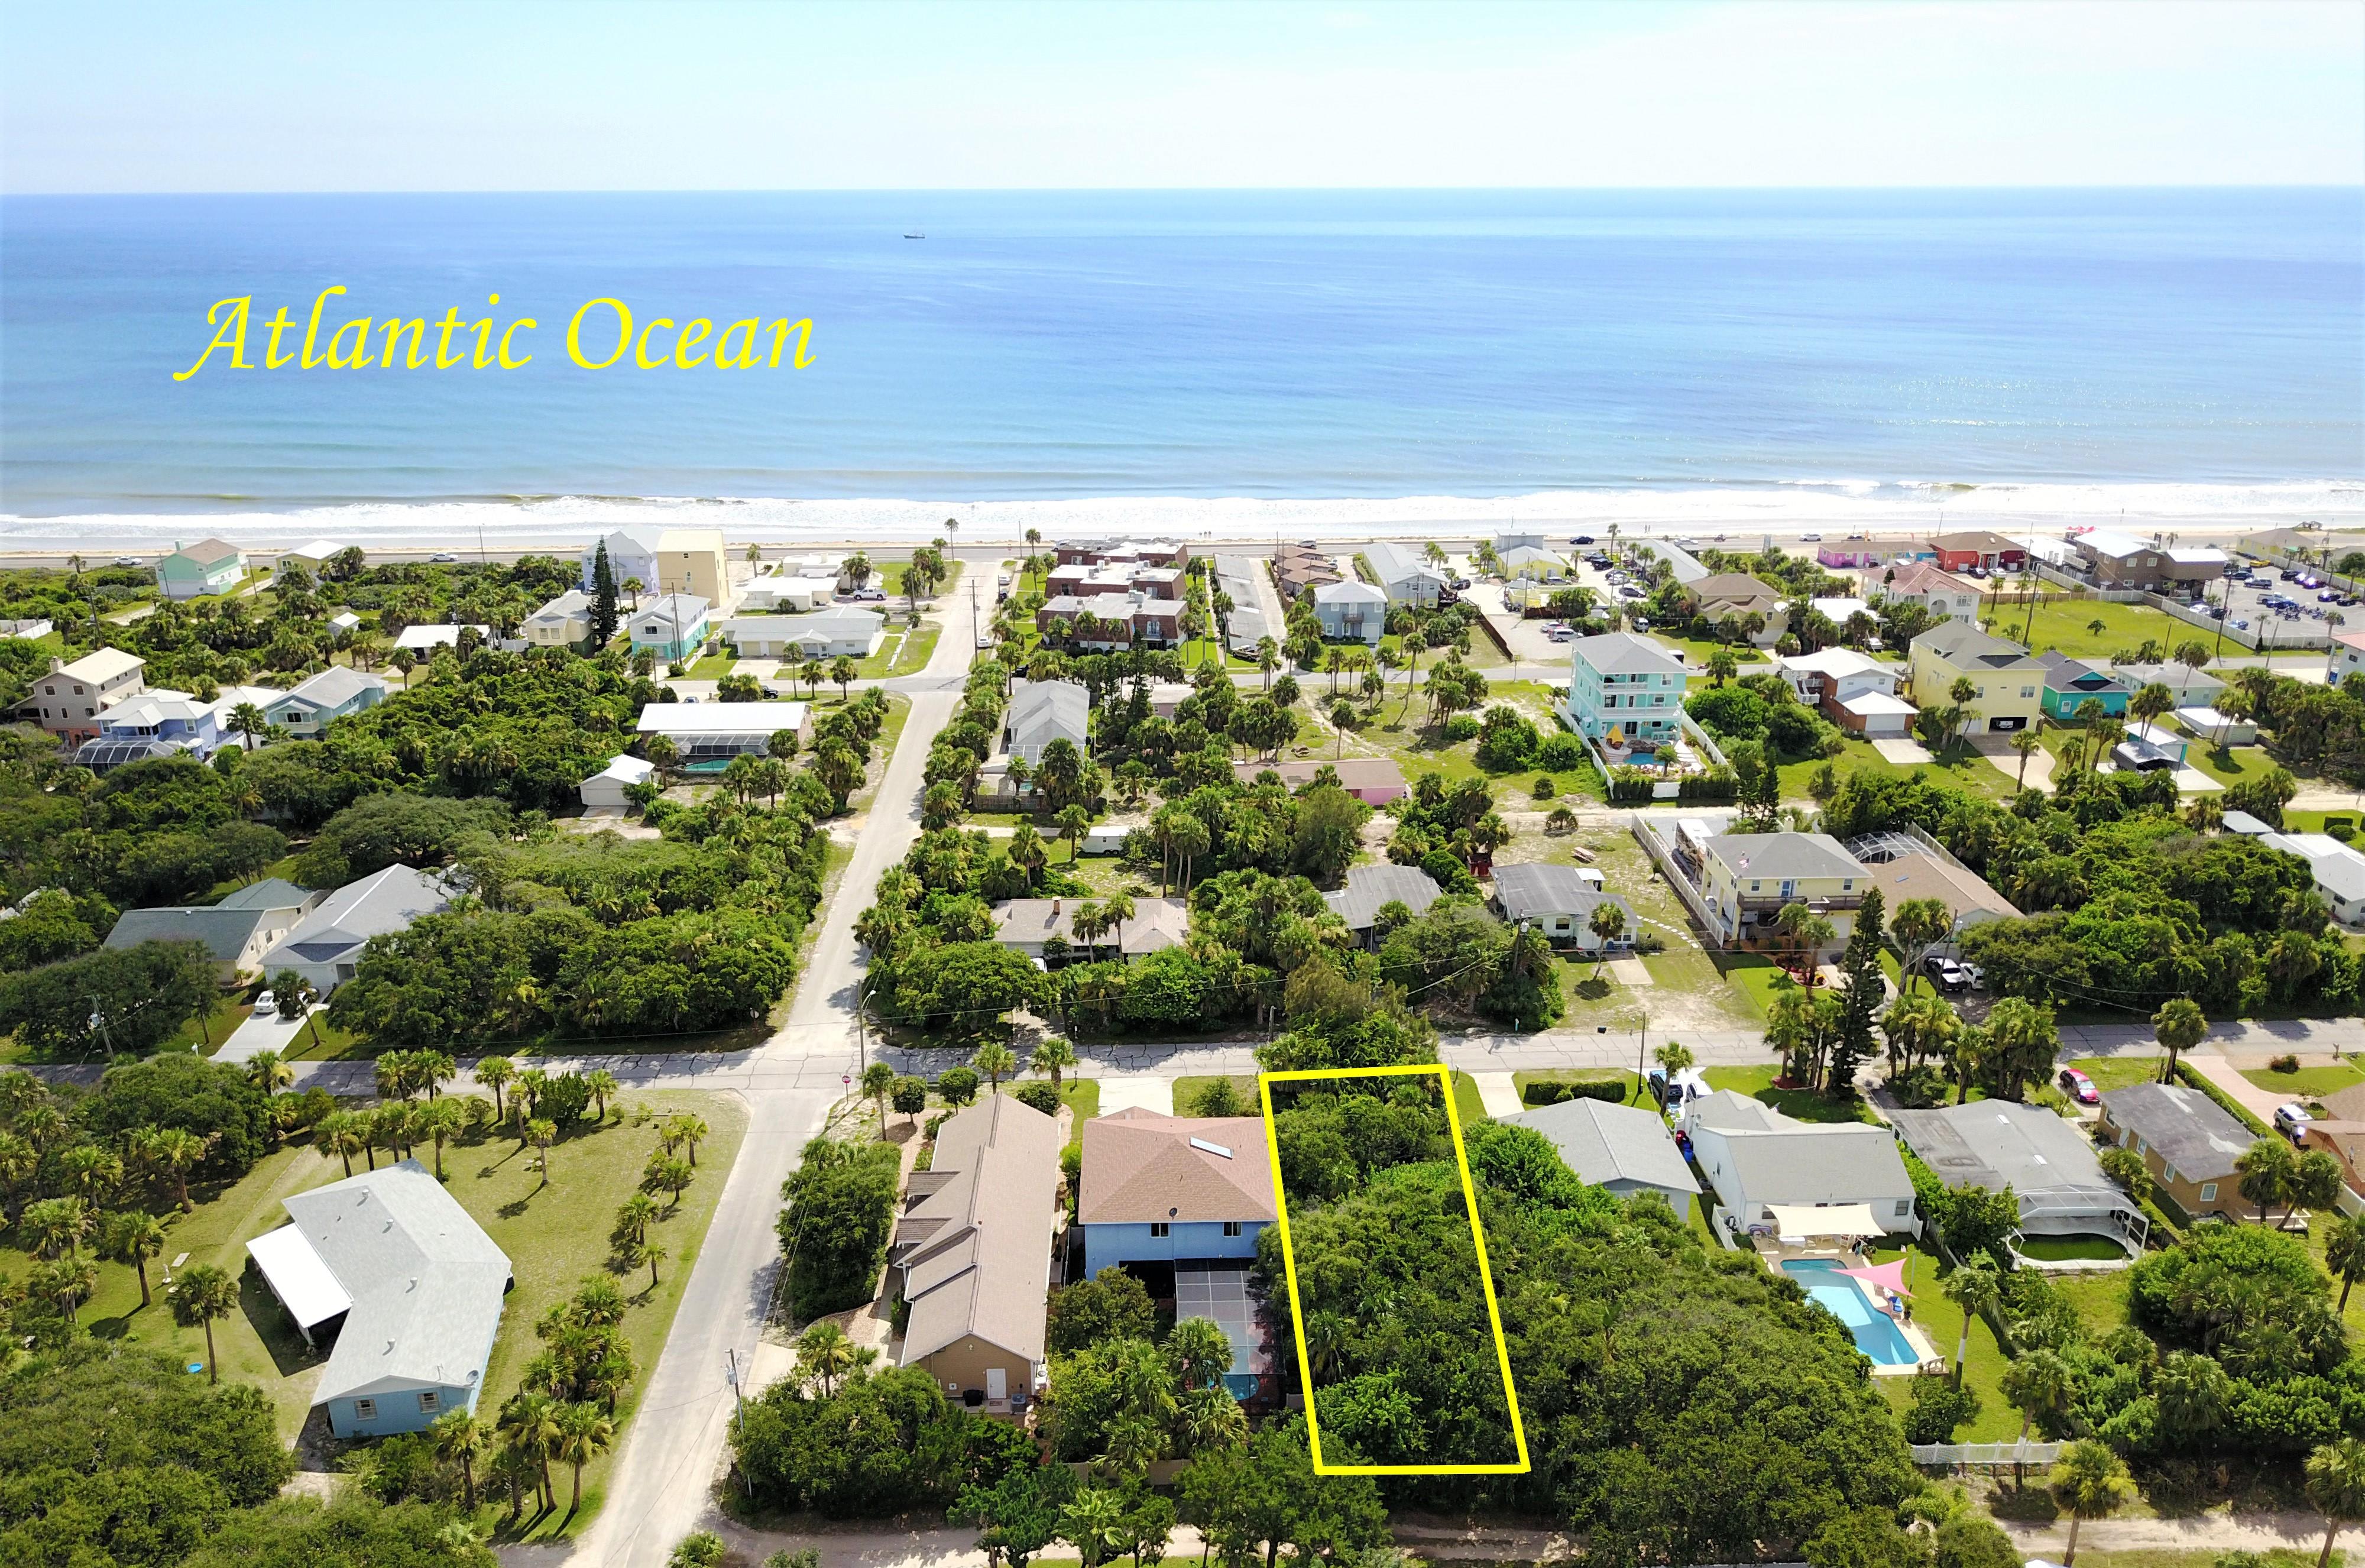 10808 S. Daytona Ave. Flagler Beach, FL